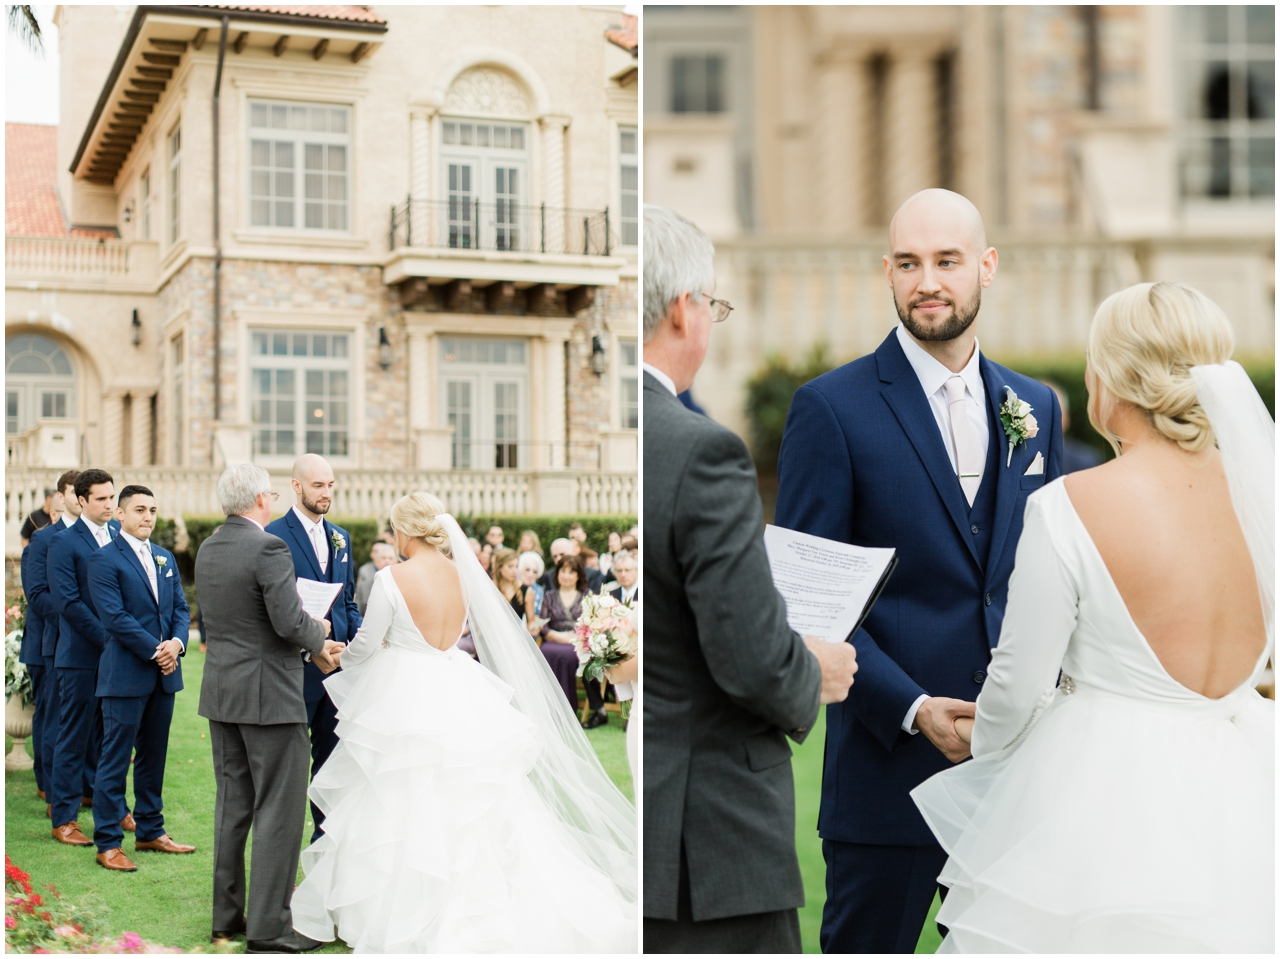 Jacksonville-Wedding-photographers-brooke-images-TPC-Sawgrass-Wedding-Mary-Kevin-blog_0026.jpg